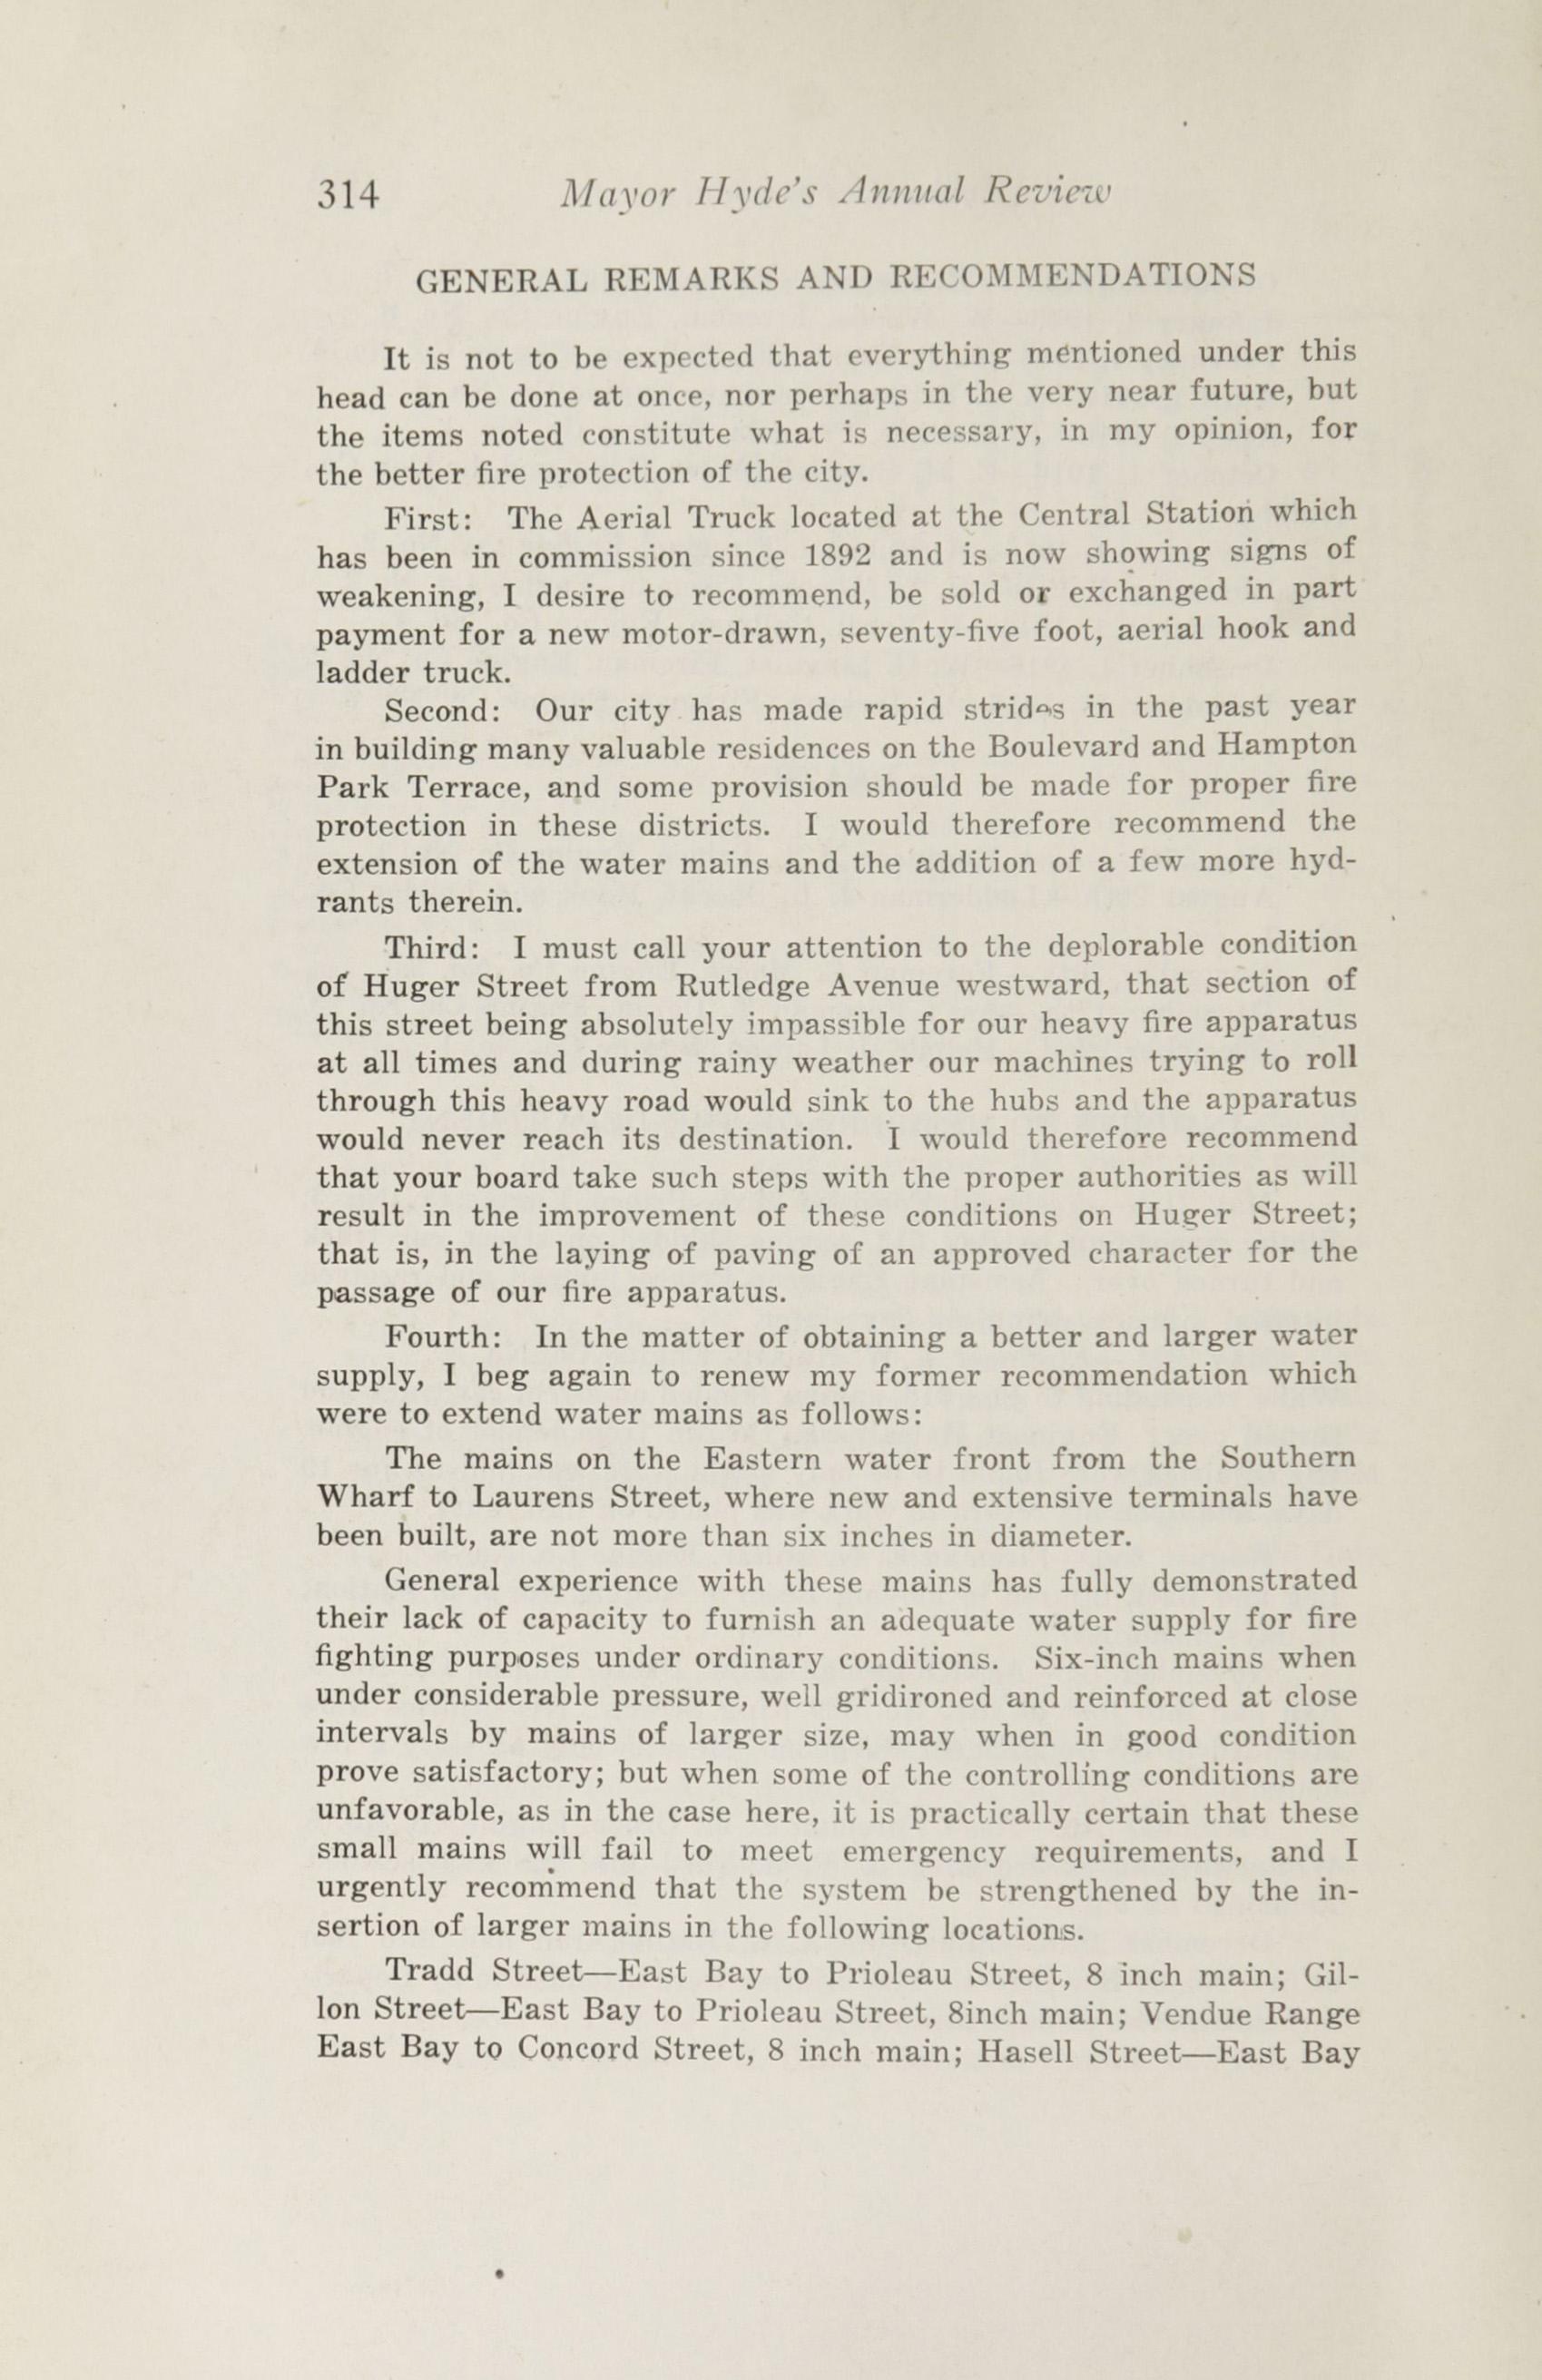 Charleston Yearbook, 1916, page 314